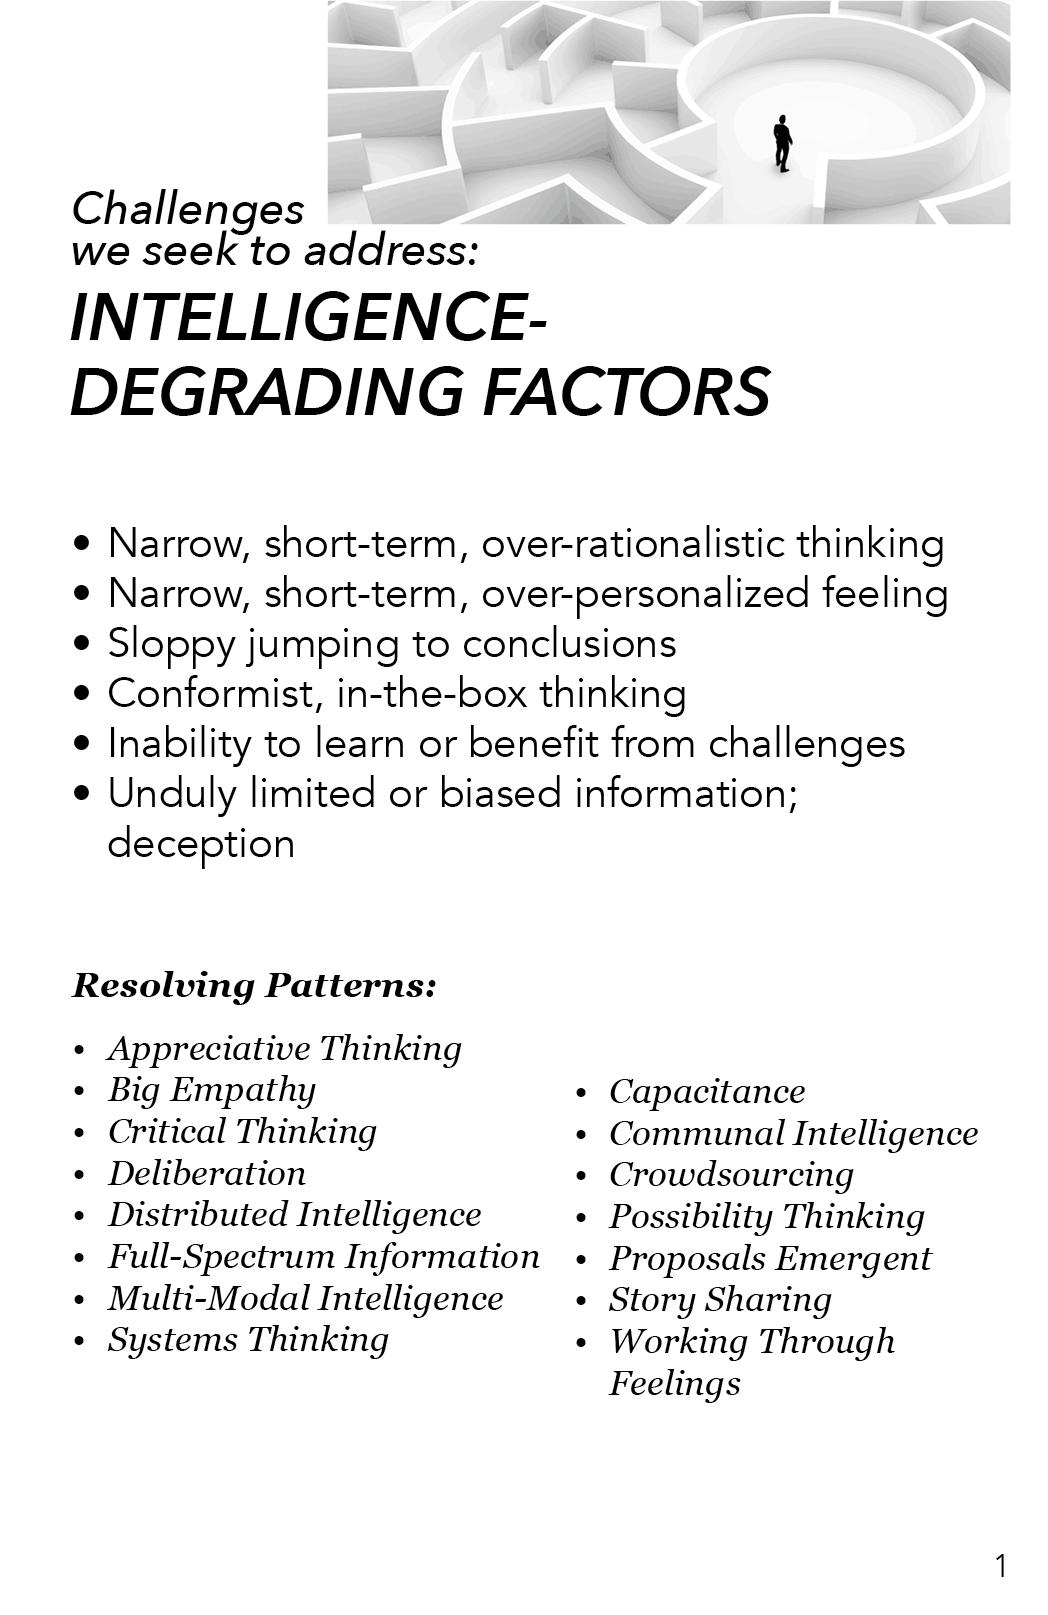 AAA - Intelligence Degrading Factors